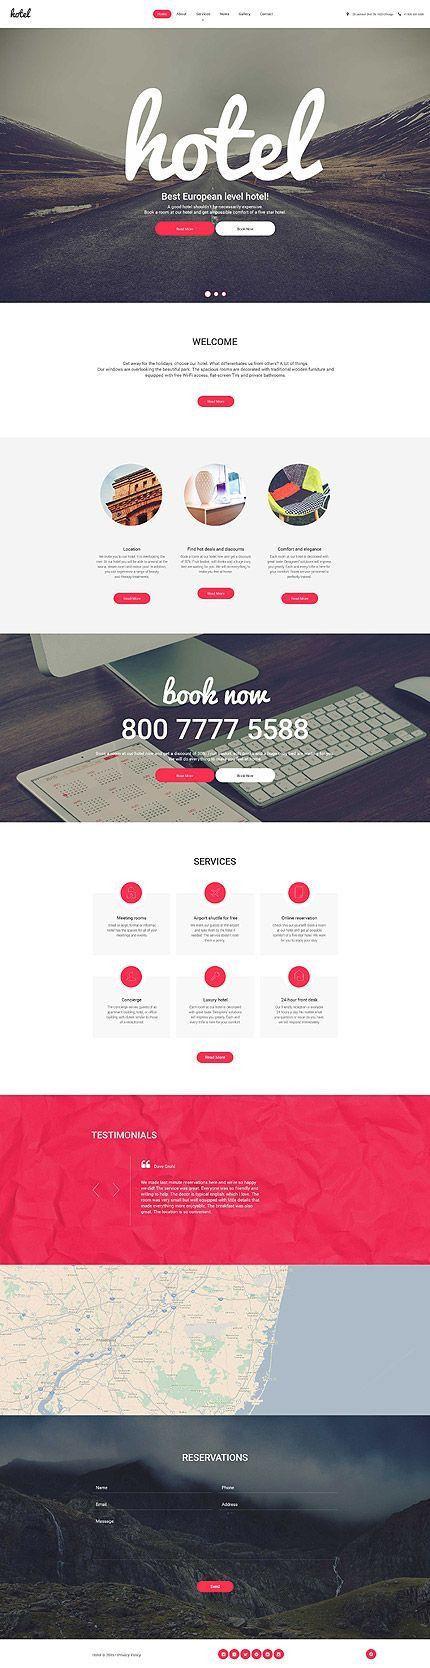 Best 20+ Wordpress template ideas on Pinterest | Web inspiration ...